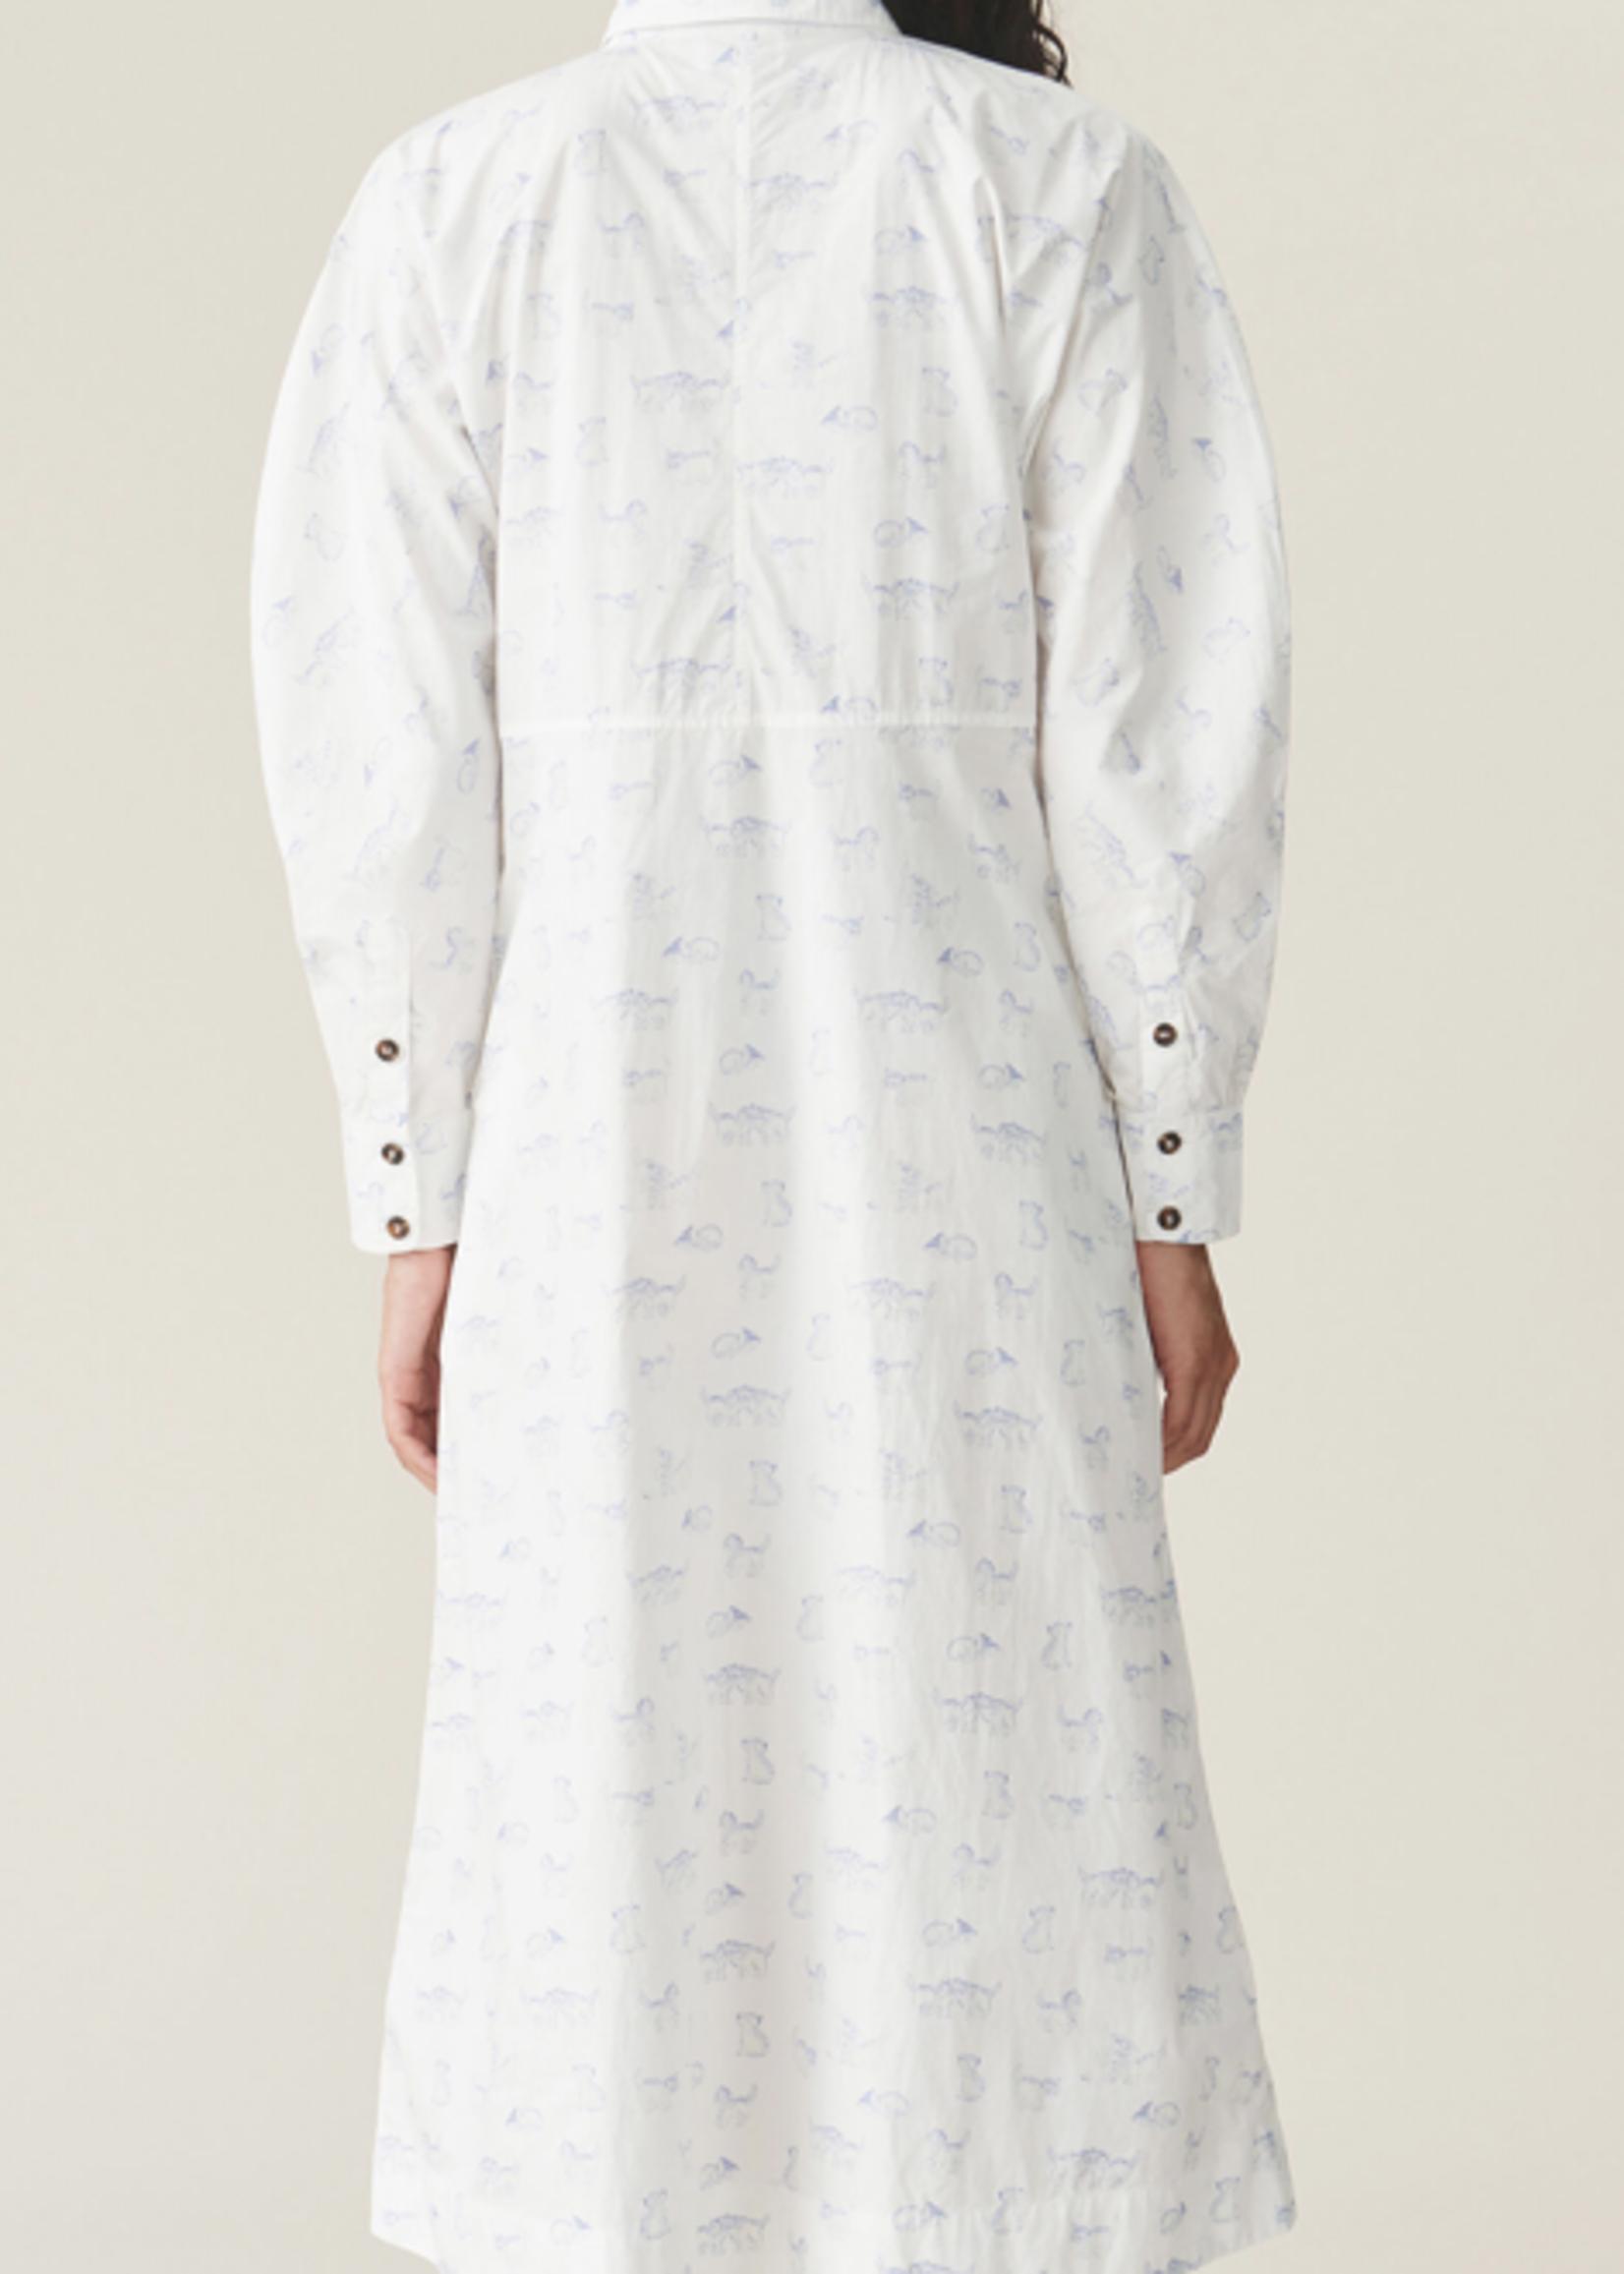 GANNI GANNI Shirt Dress with Kitten Print